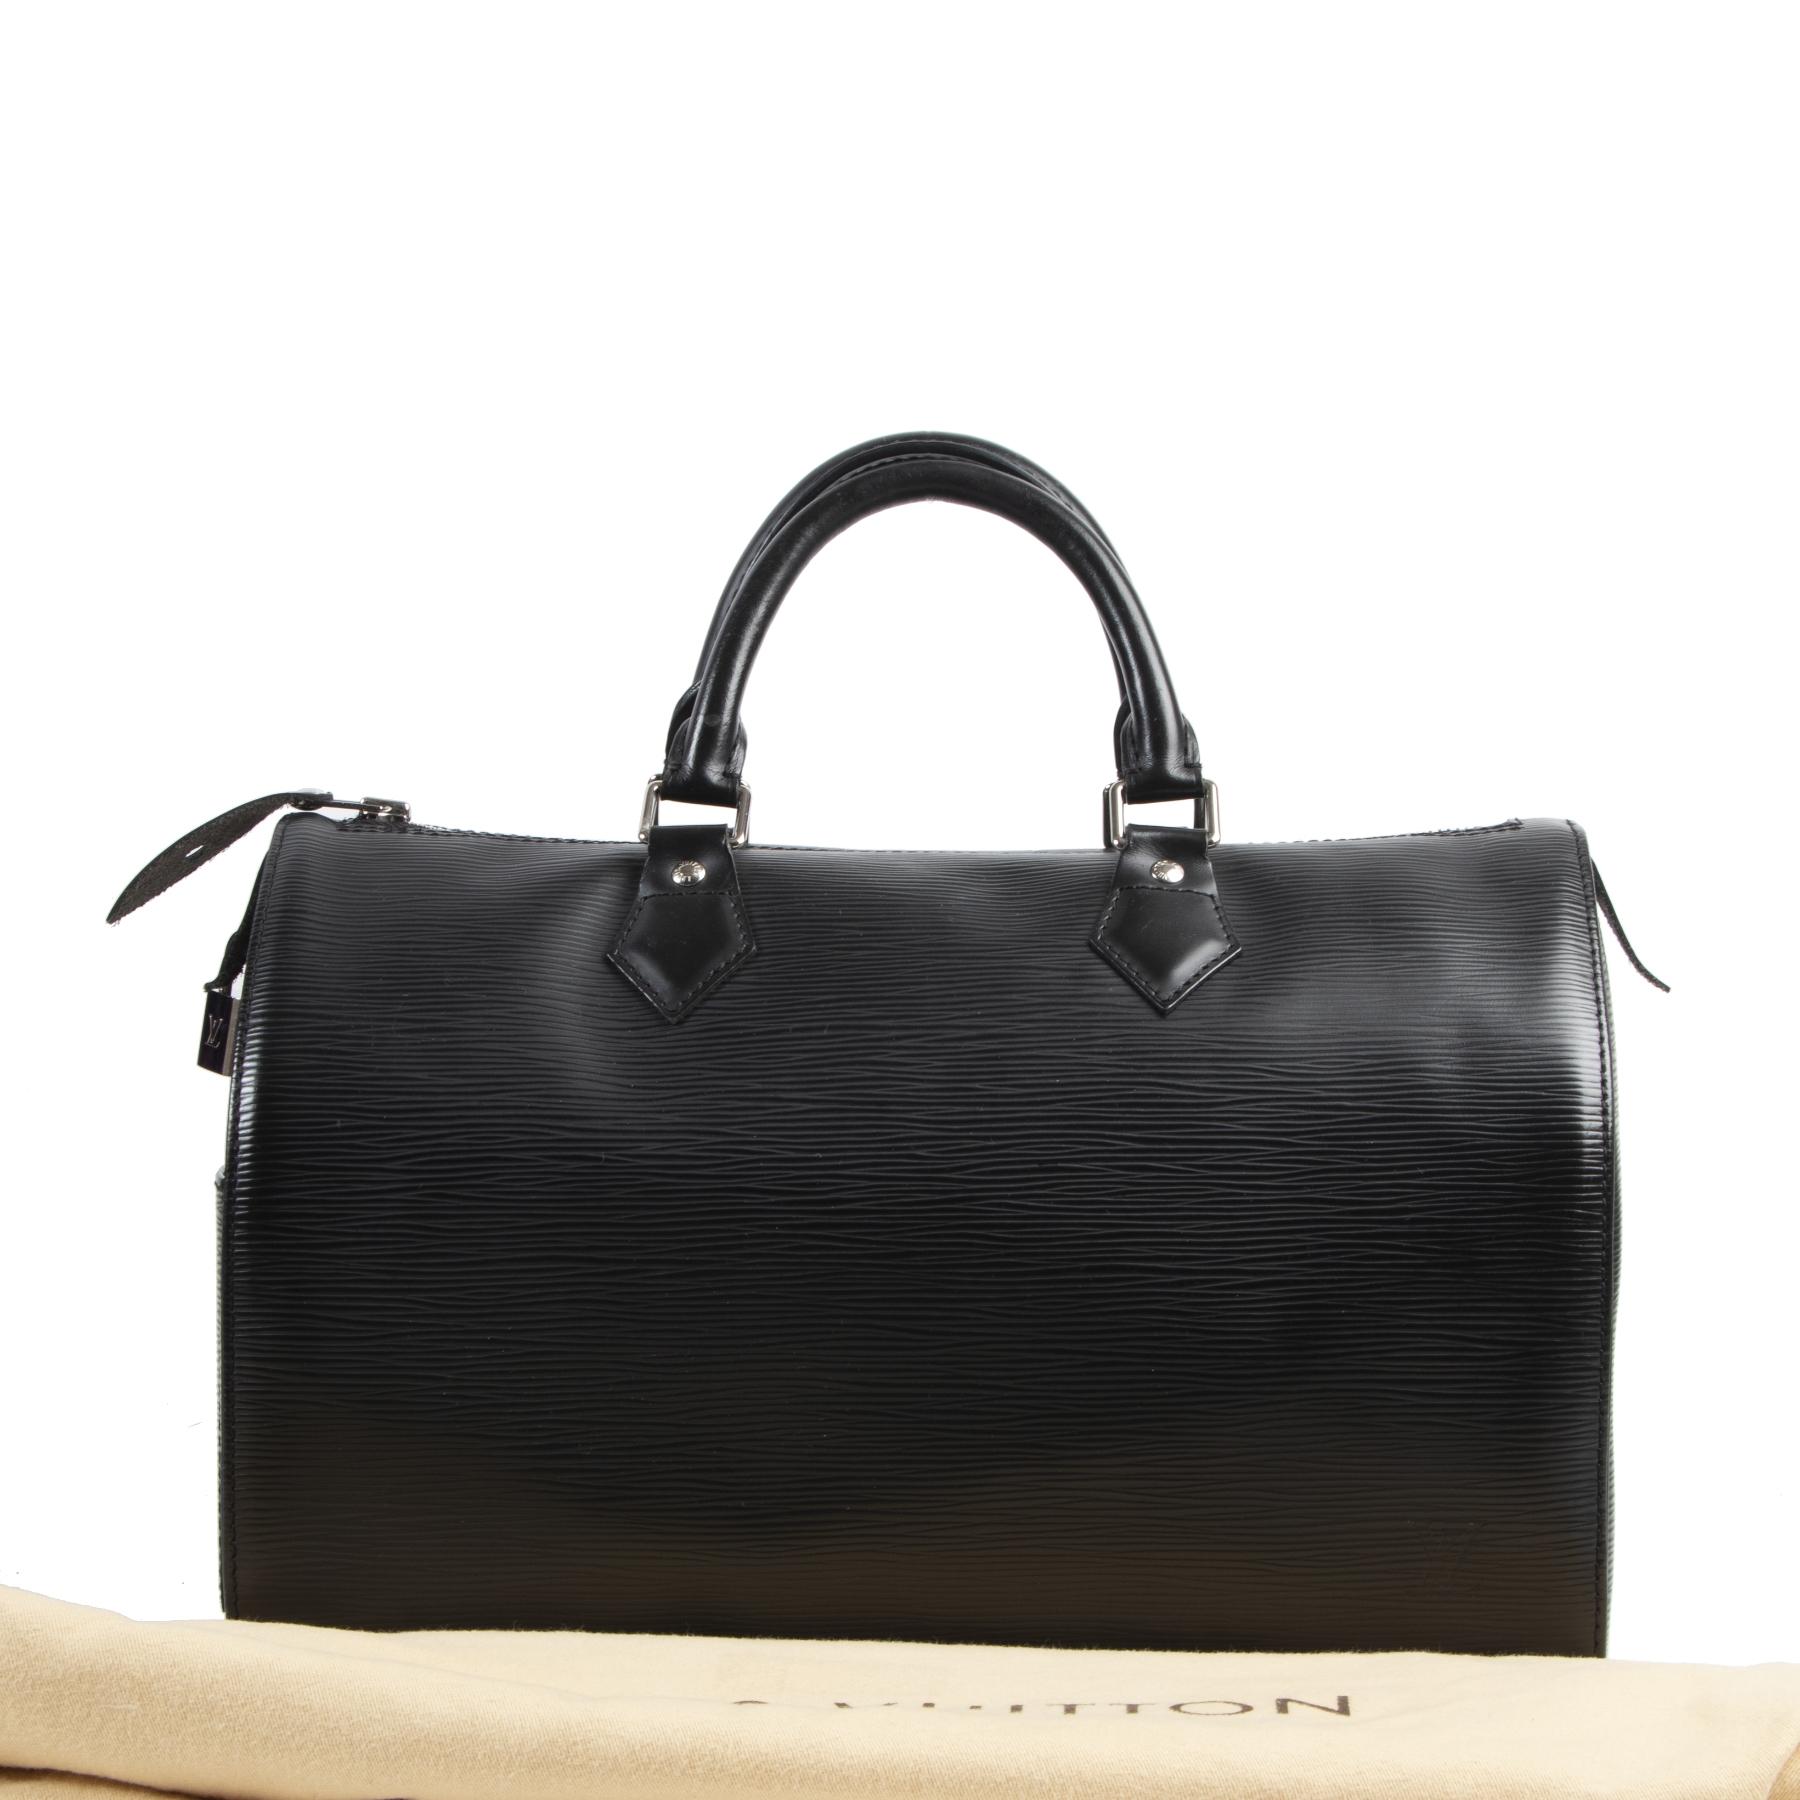 beautiful secondhand Louis Vuitton Black Epi Speedy 35 Bag